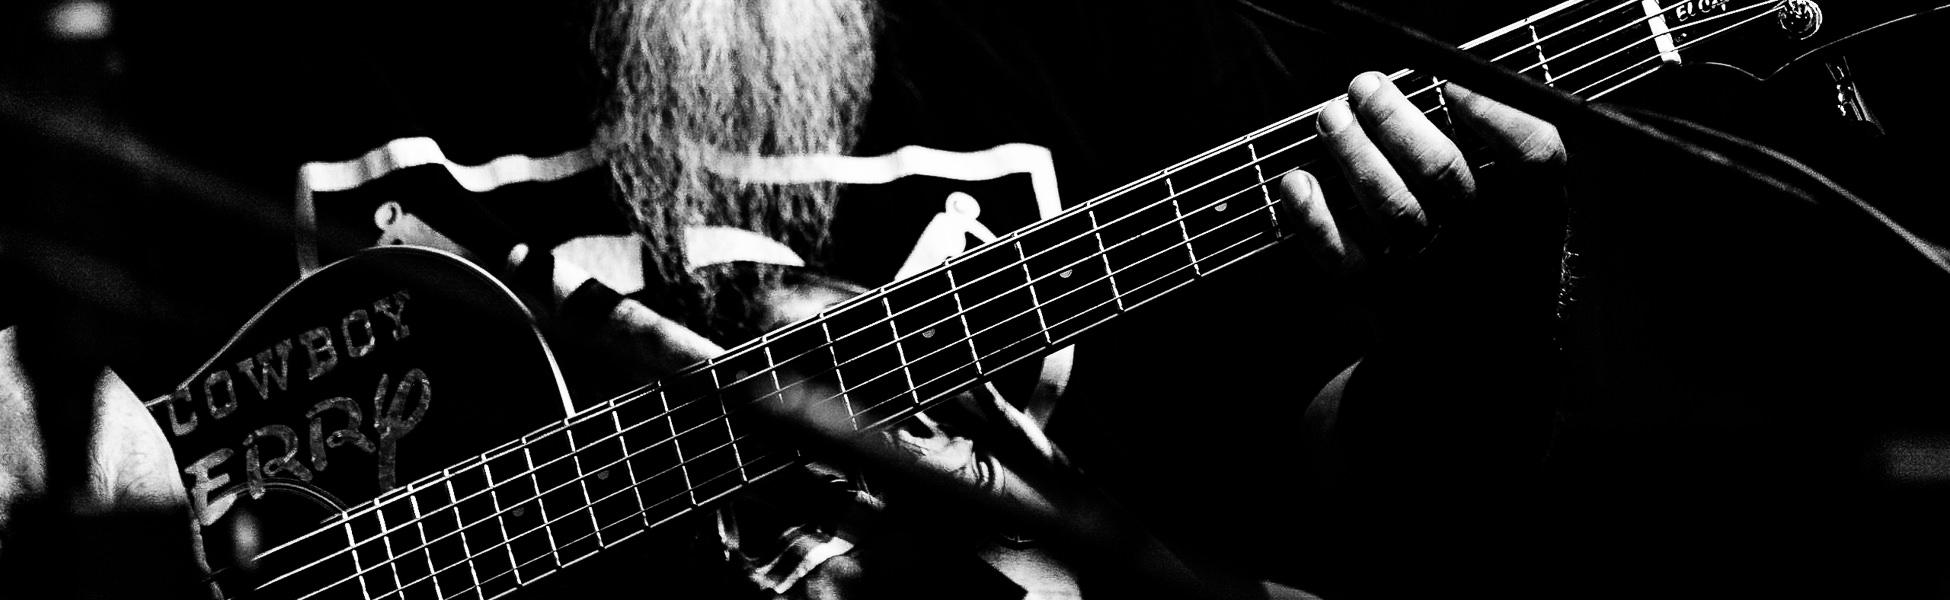 entertainment live music guitar